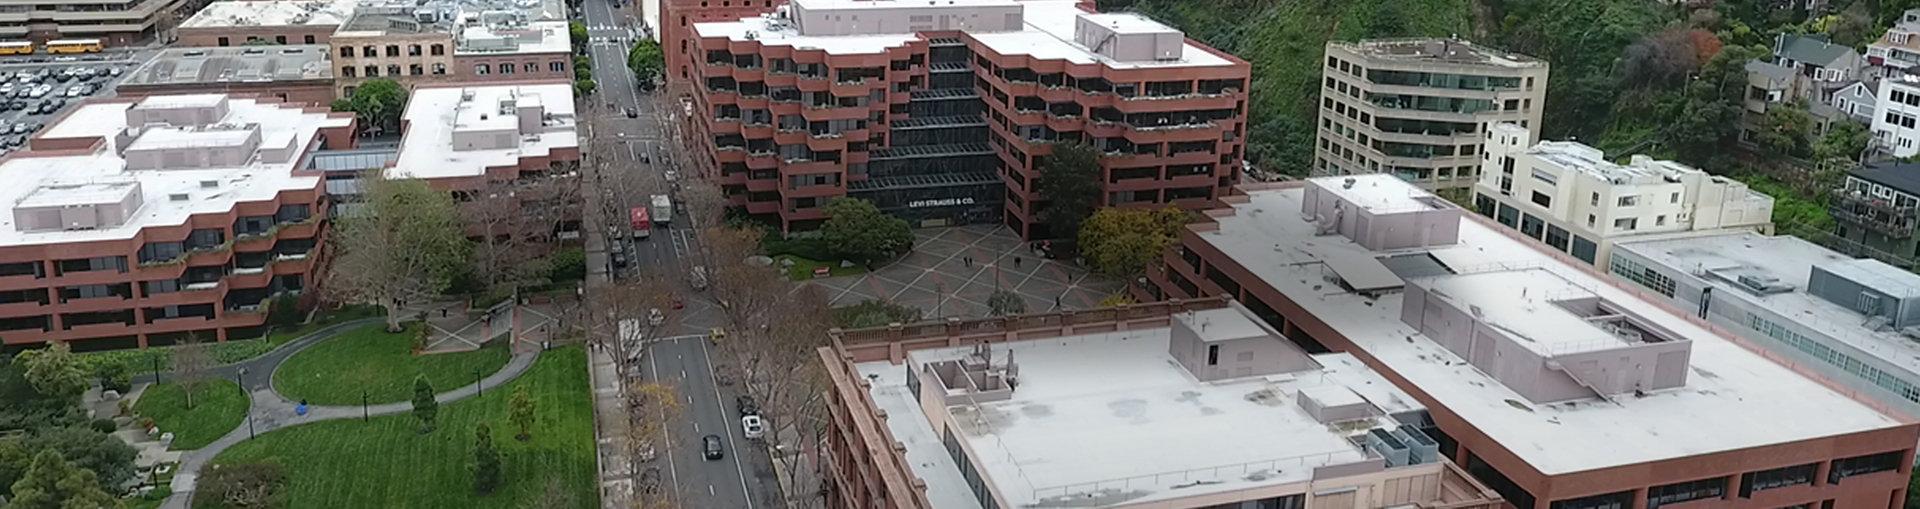 Bird's eye view Levi's San Francisco Office